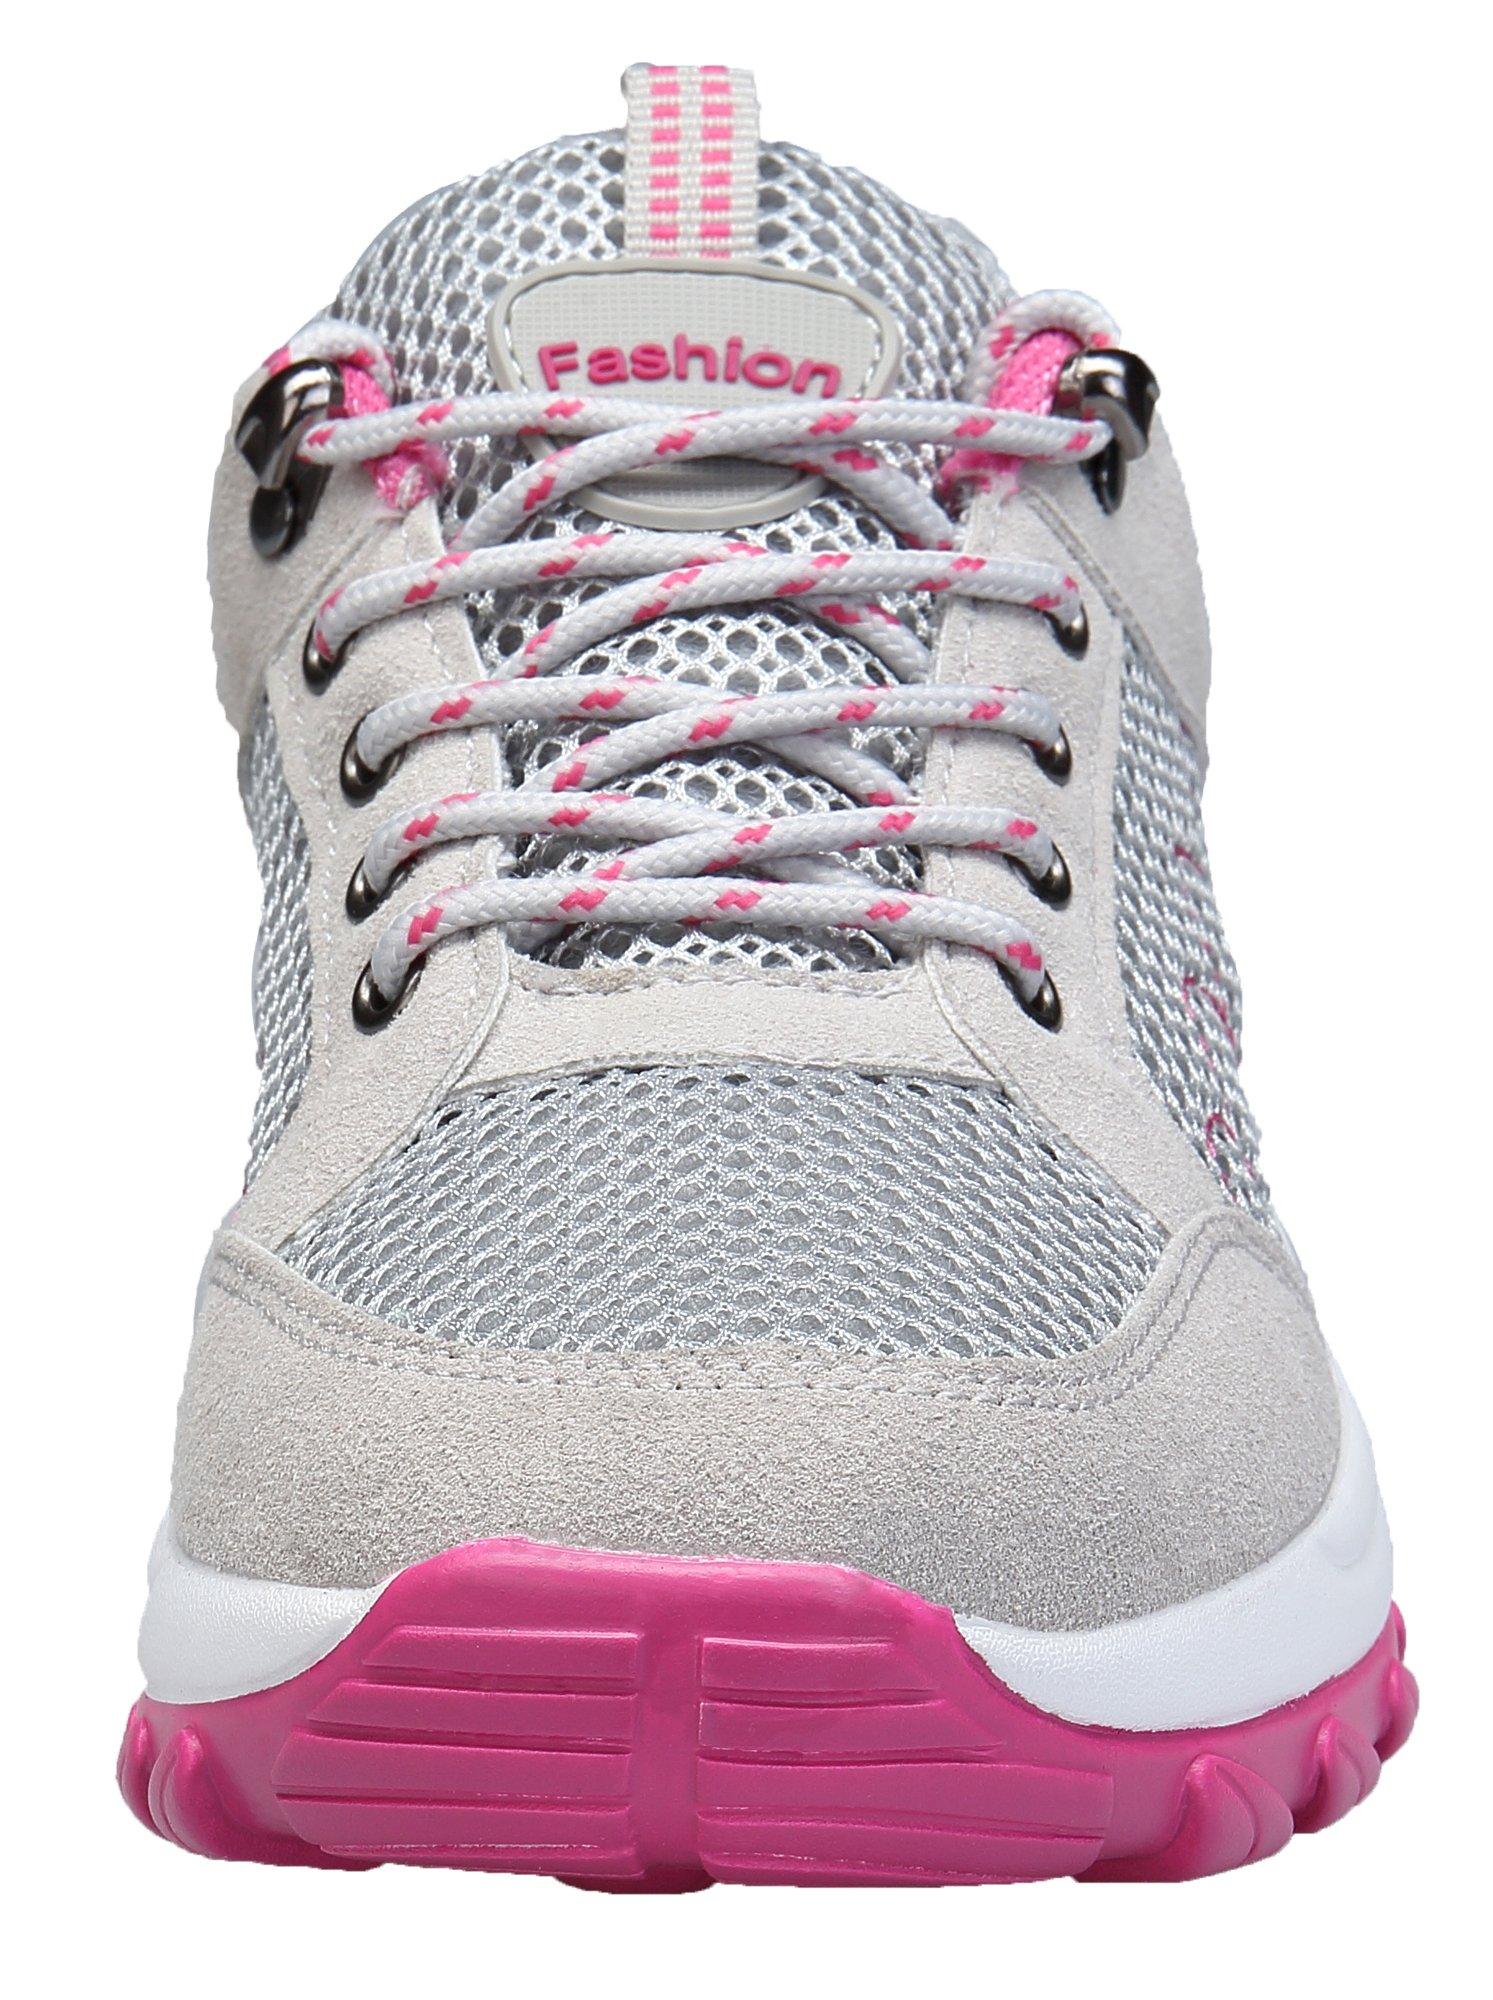 1dca8a0a41 KOUDYEN Scarpe da Ginnastica Donna Sportive Scarpe da Corsa Running  Palestra Sneakers